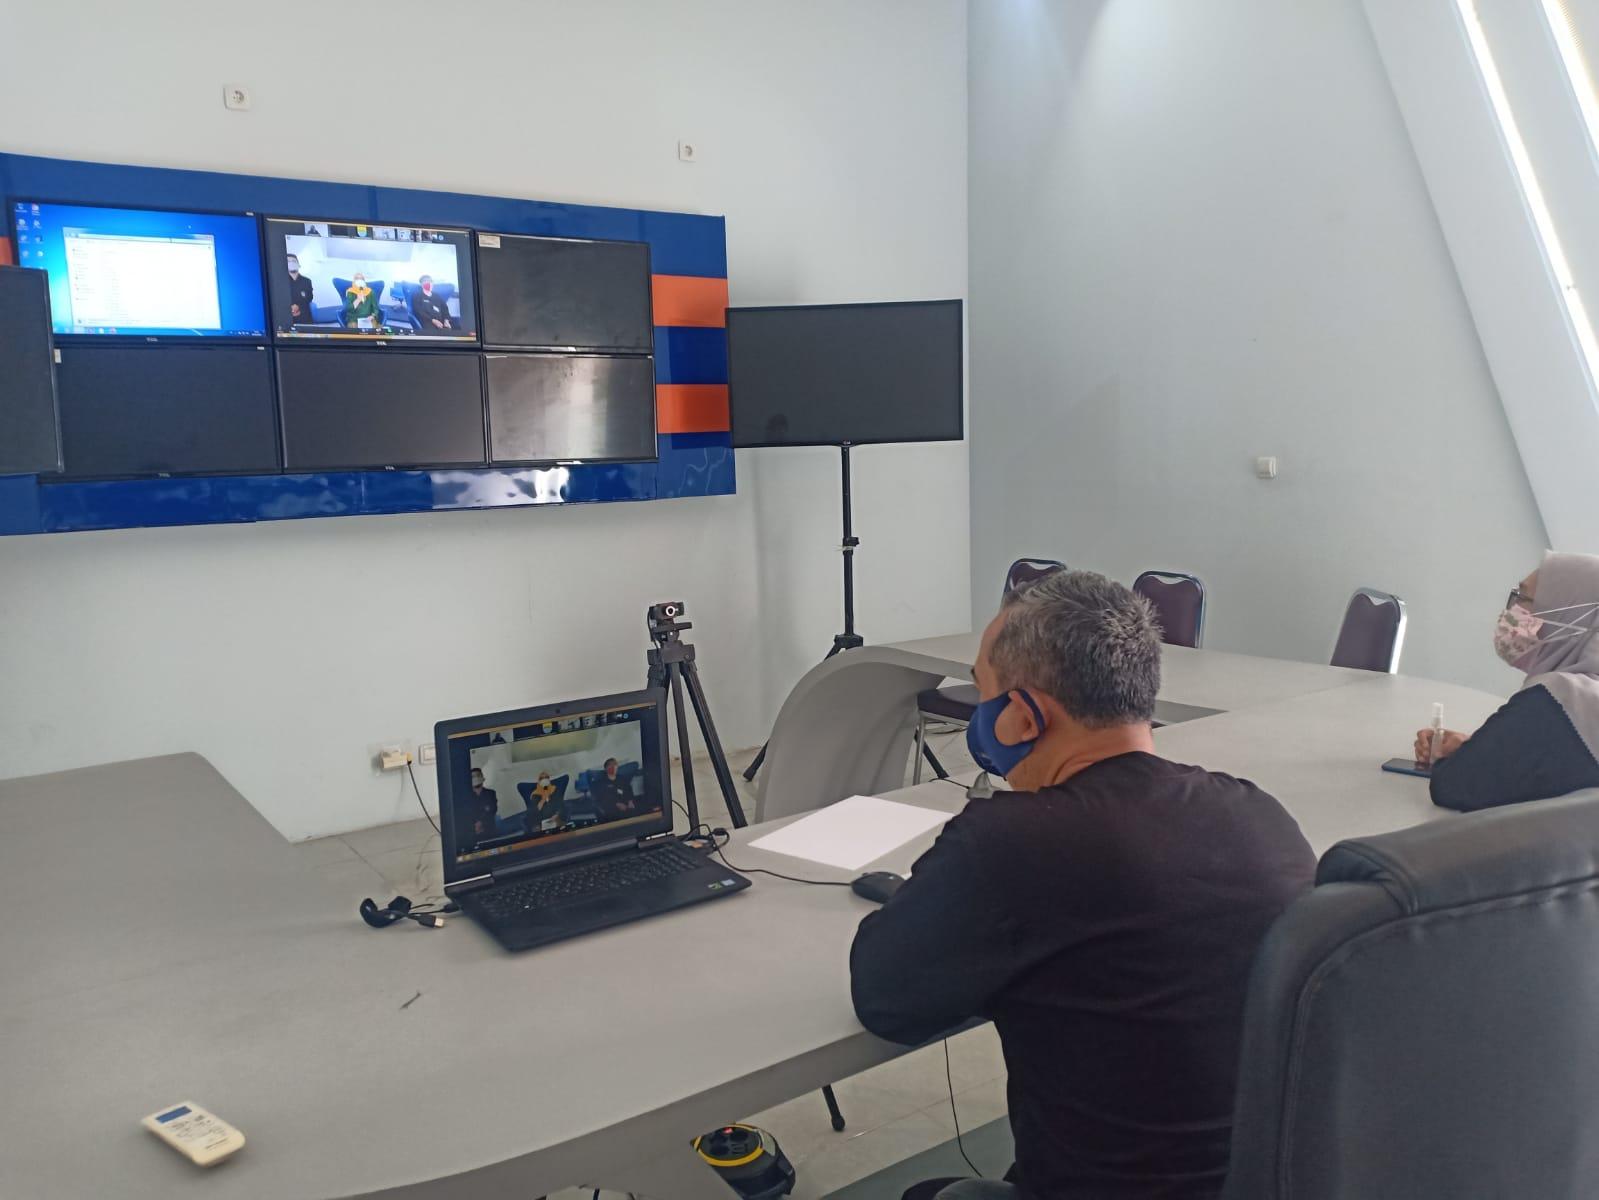 Rapat koordinasi PPID Pembantu dan PPID Sub Pembantu dalam rangka pembahasan sosialisasi keputusan KI Pusat tentang Prosedur Penghentian Proses penyelesaian sengketa Informasi Publik secara virtual, Kamis 19 Agustus 2021